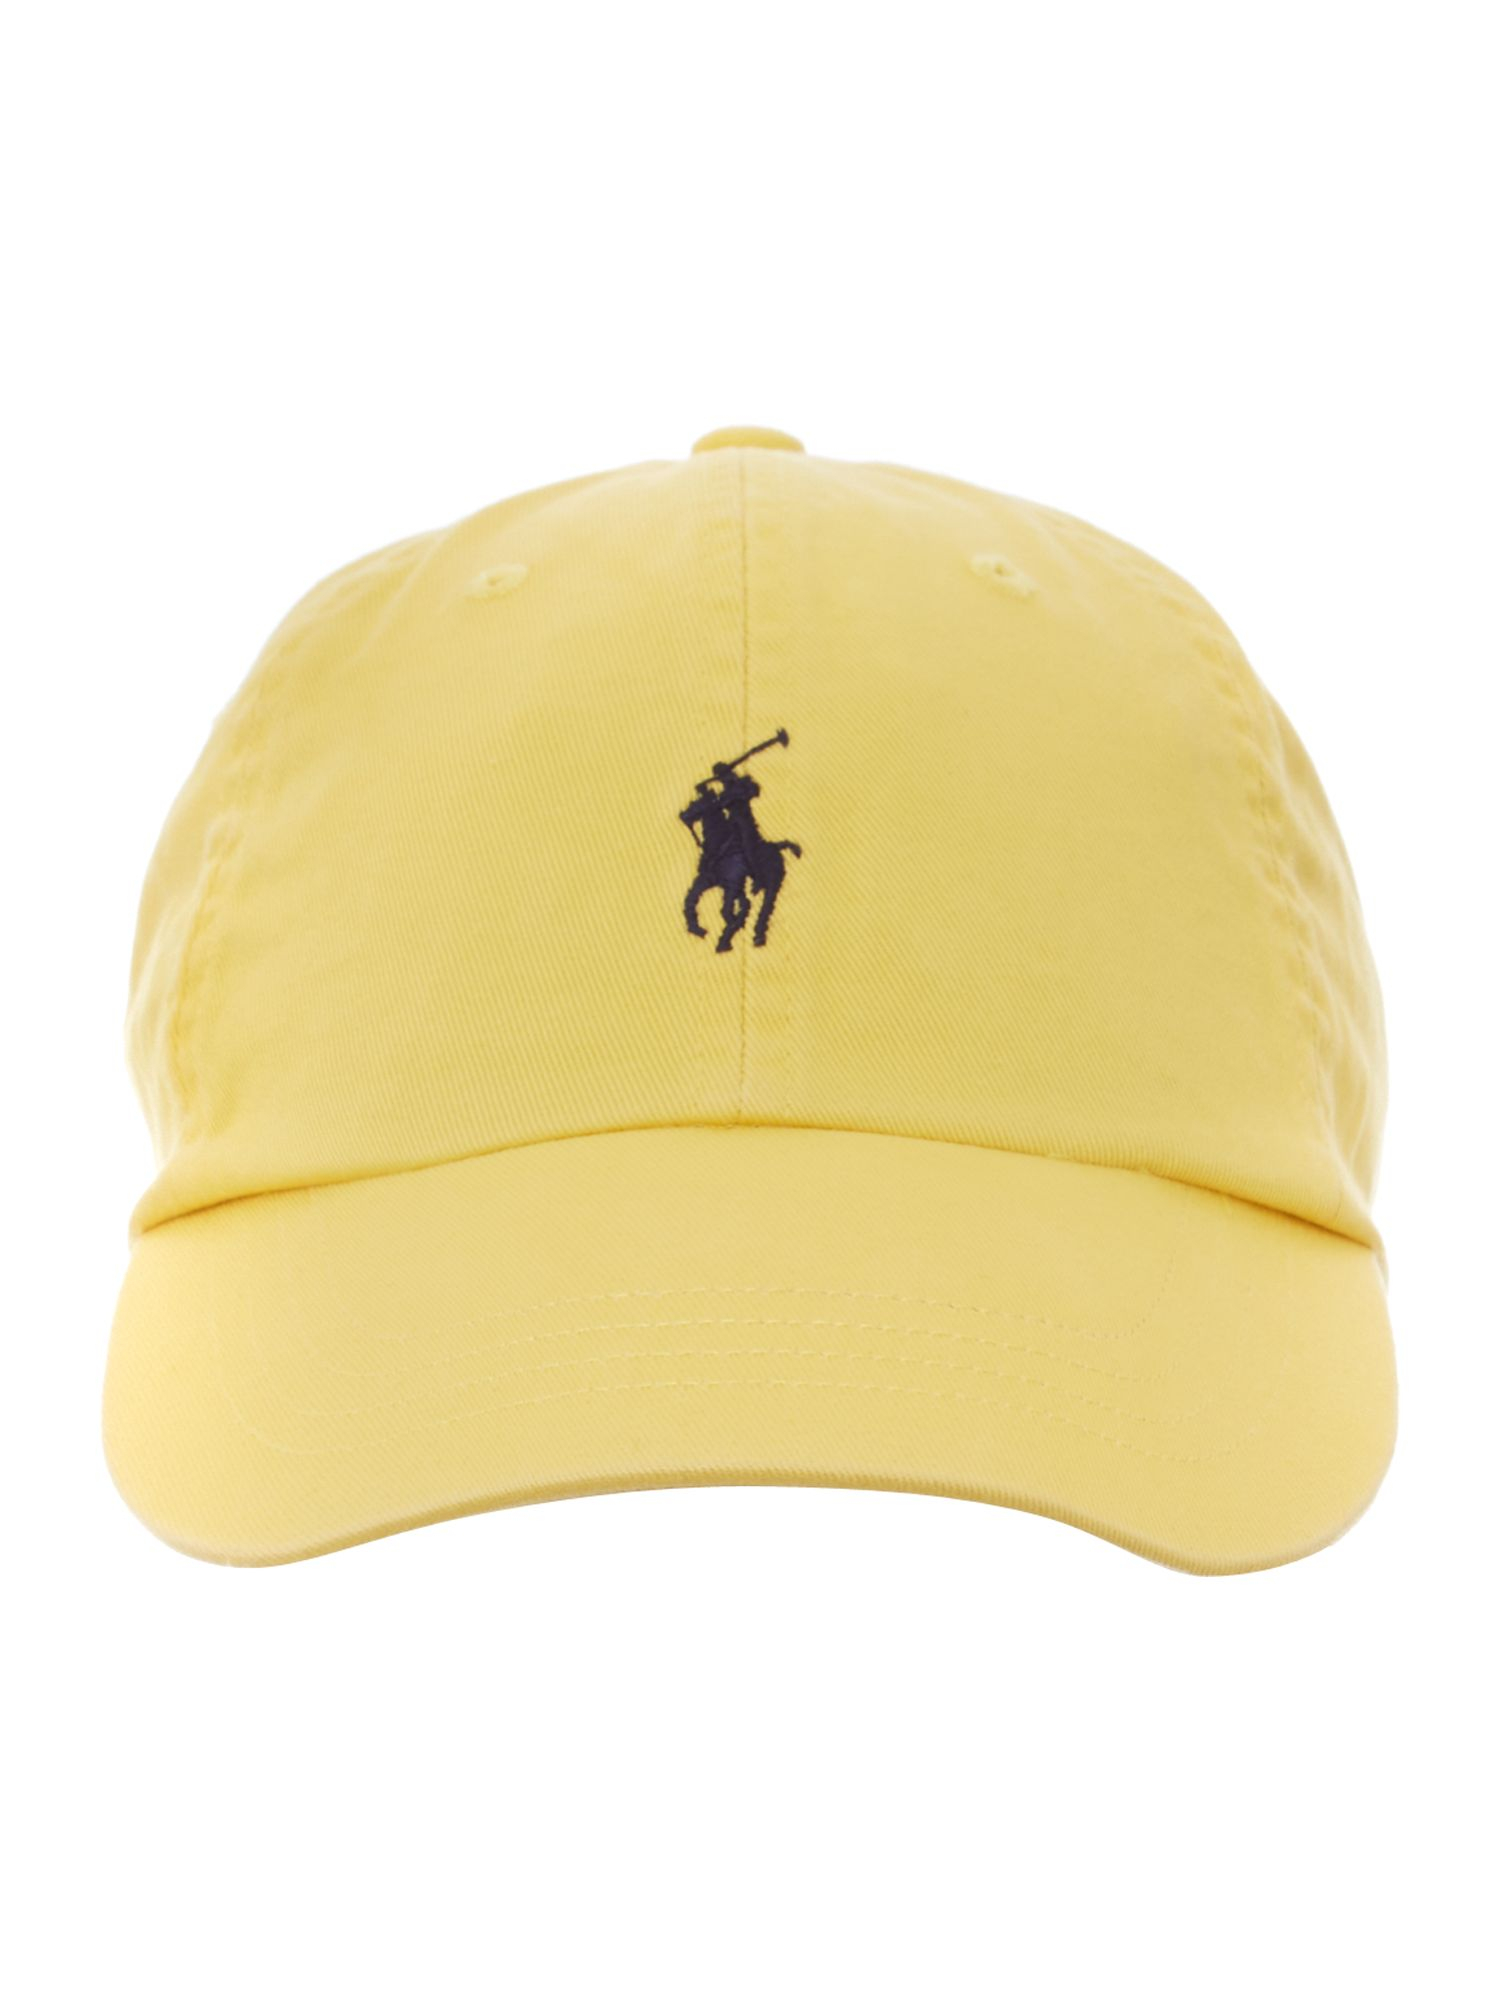 polo ralph lauren classic logo sport cap in yellow for men. Black Bedroom Furniture Sets. Home Design Ideas